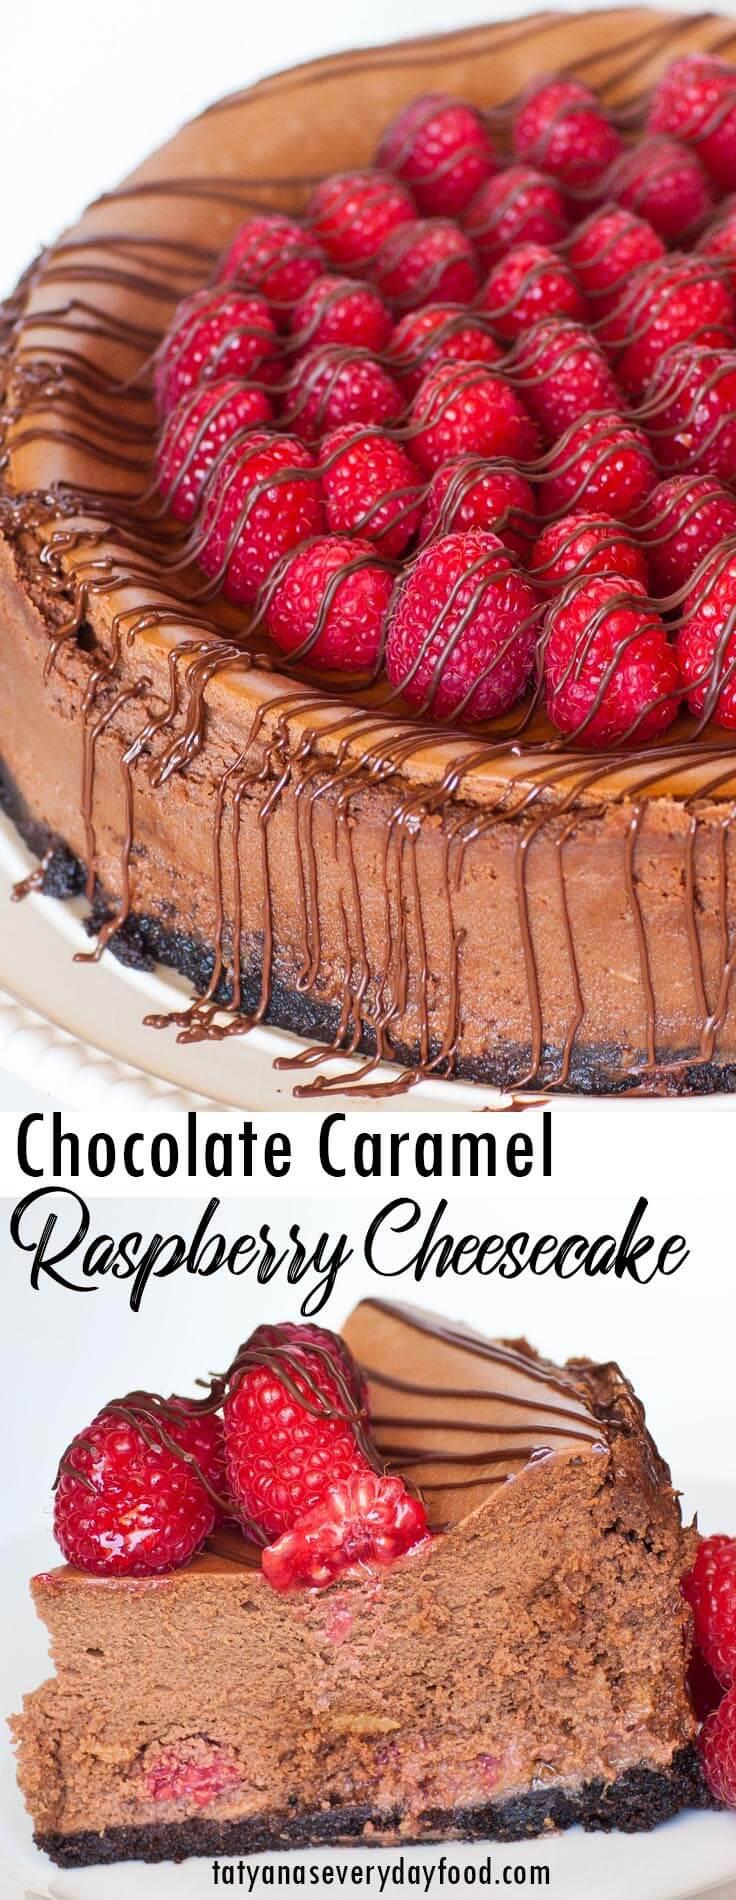 Chocolate Caramel Raspberry Cheesecake video recipe